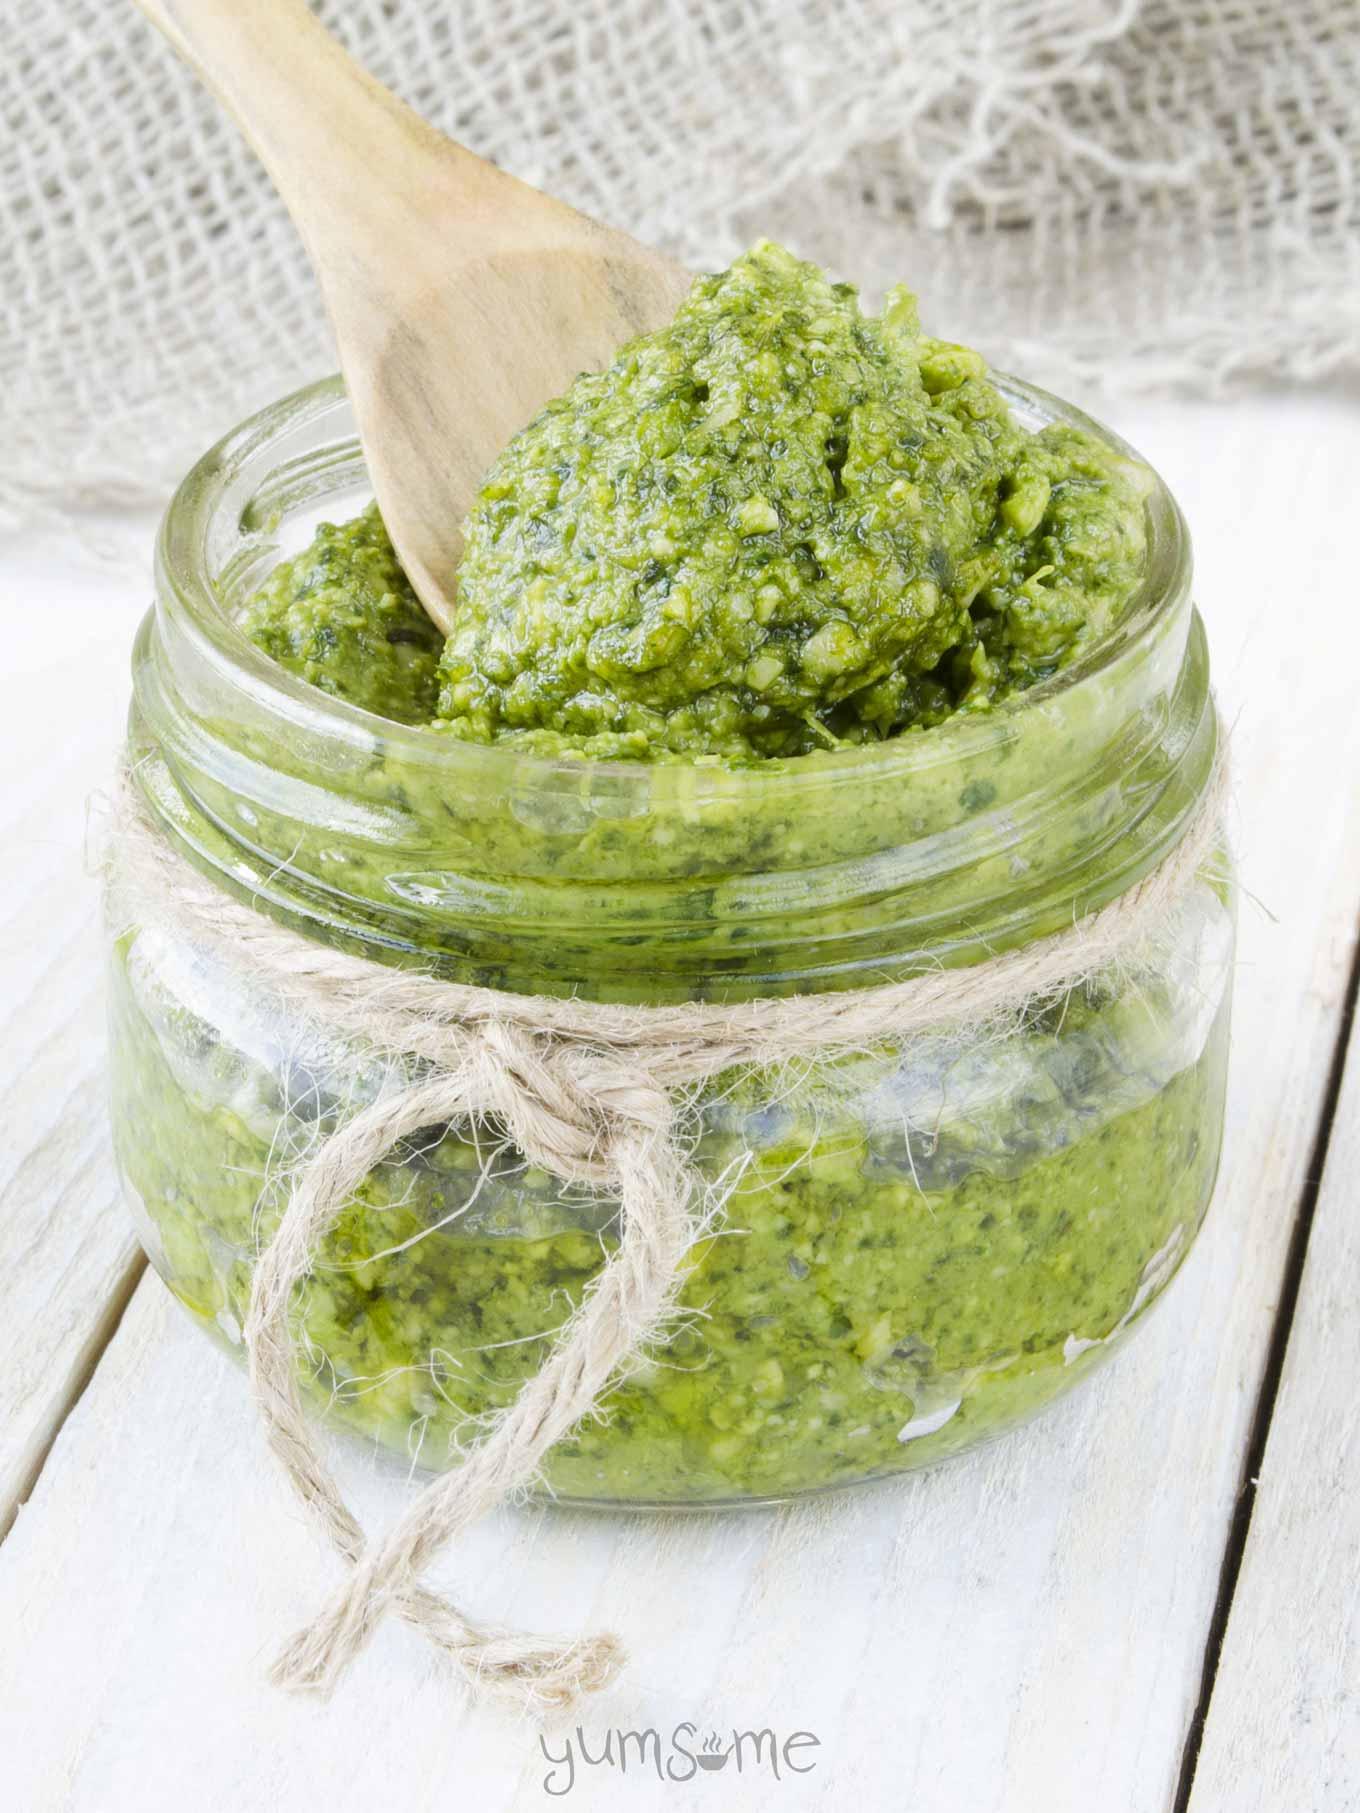 5 Minute Vegan Cashew Pesto Yumsome